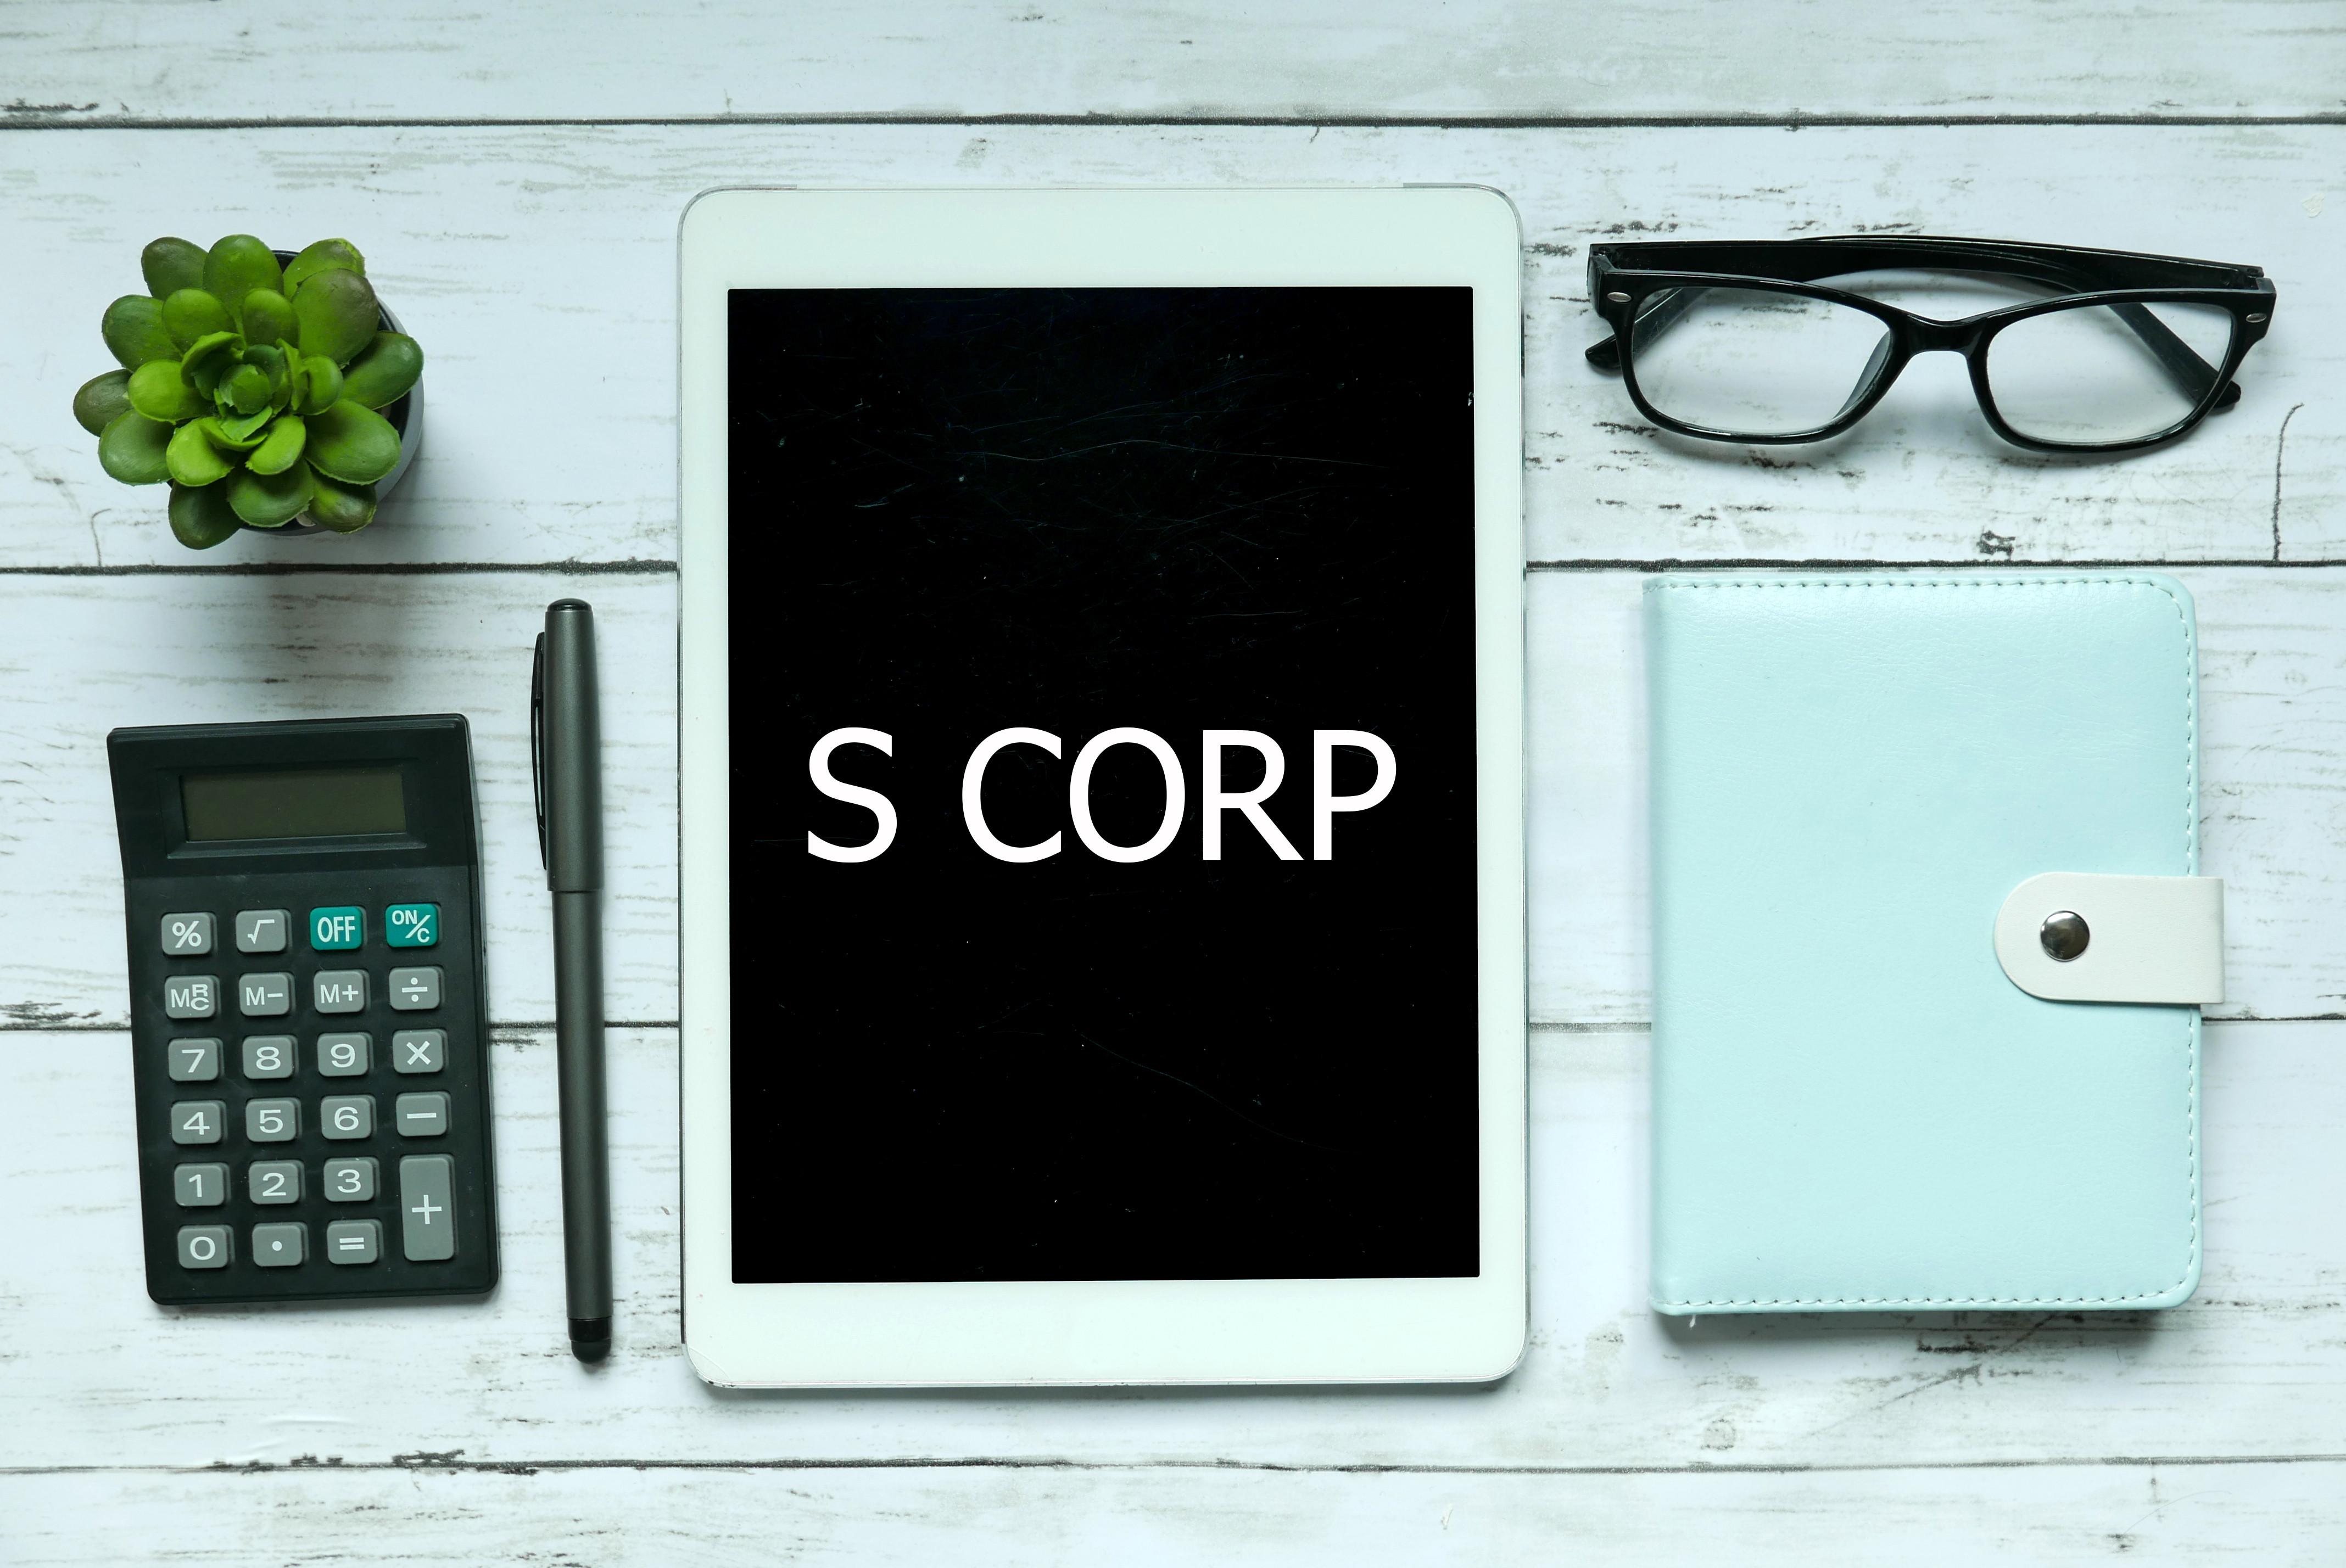 S-Corp Tax Return Preparation